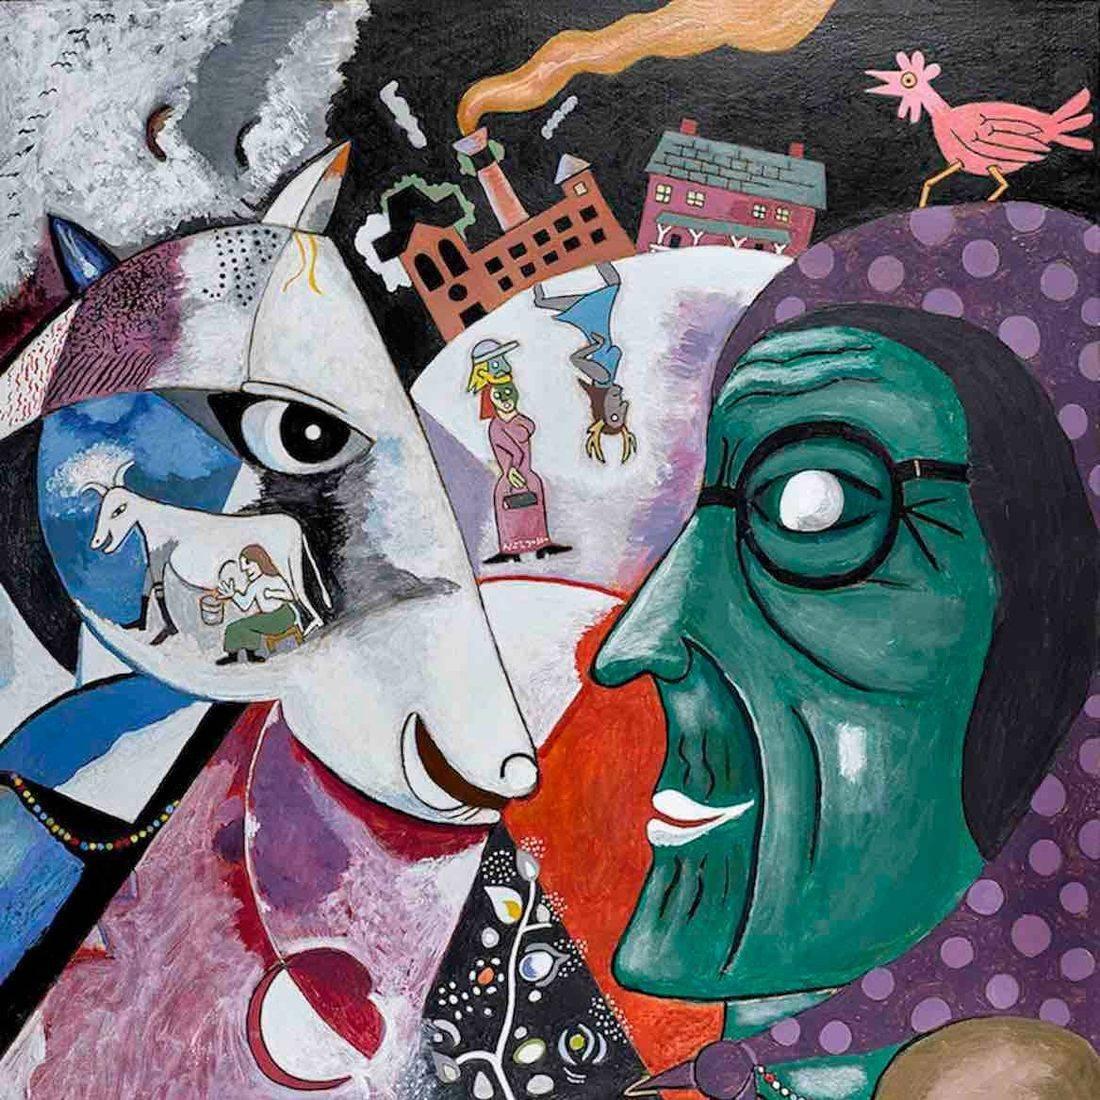 Marc Chagall, I and the Village, Grandma, Anthony Mill, Chicken, Babushka